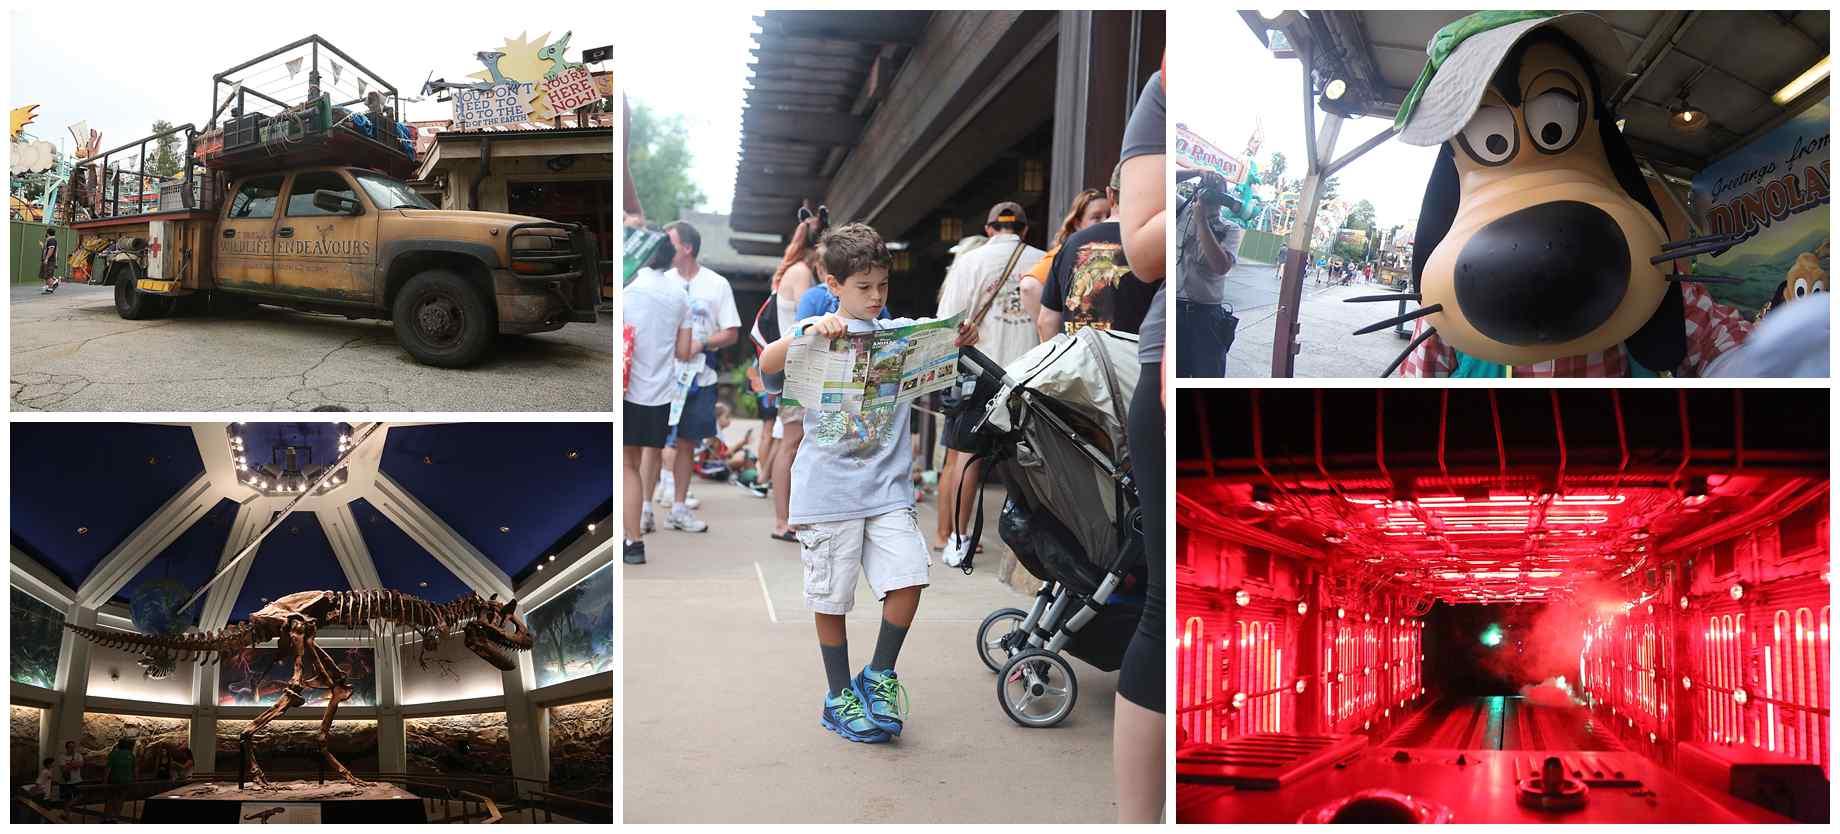 Disney-World-2015-049